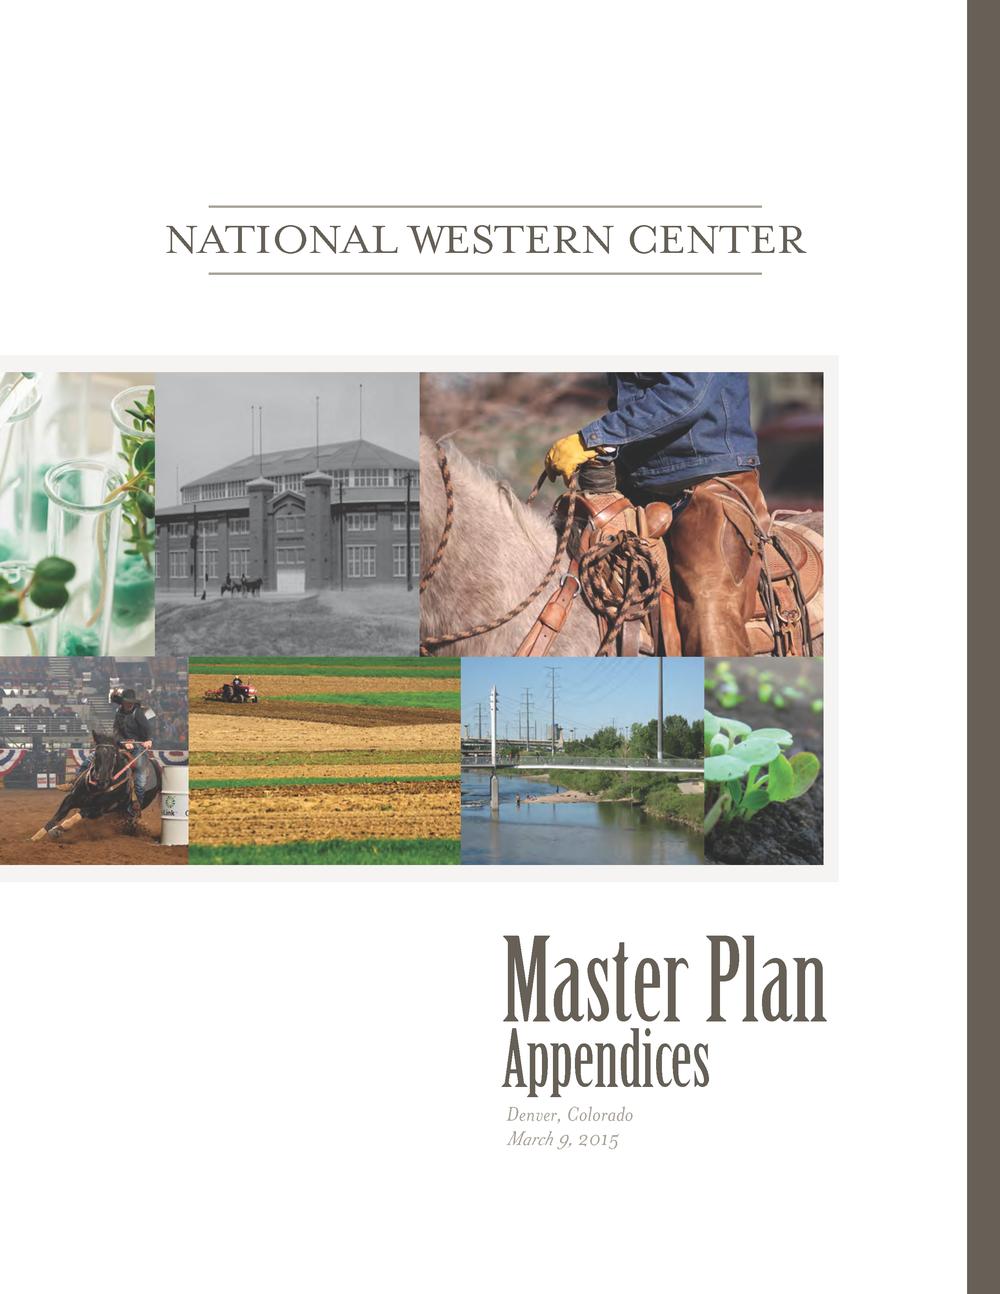 Master Plan Appendices